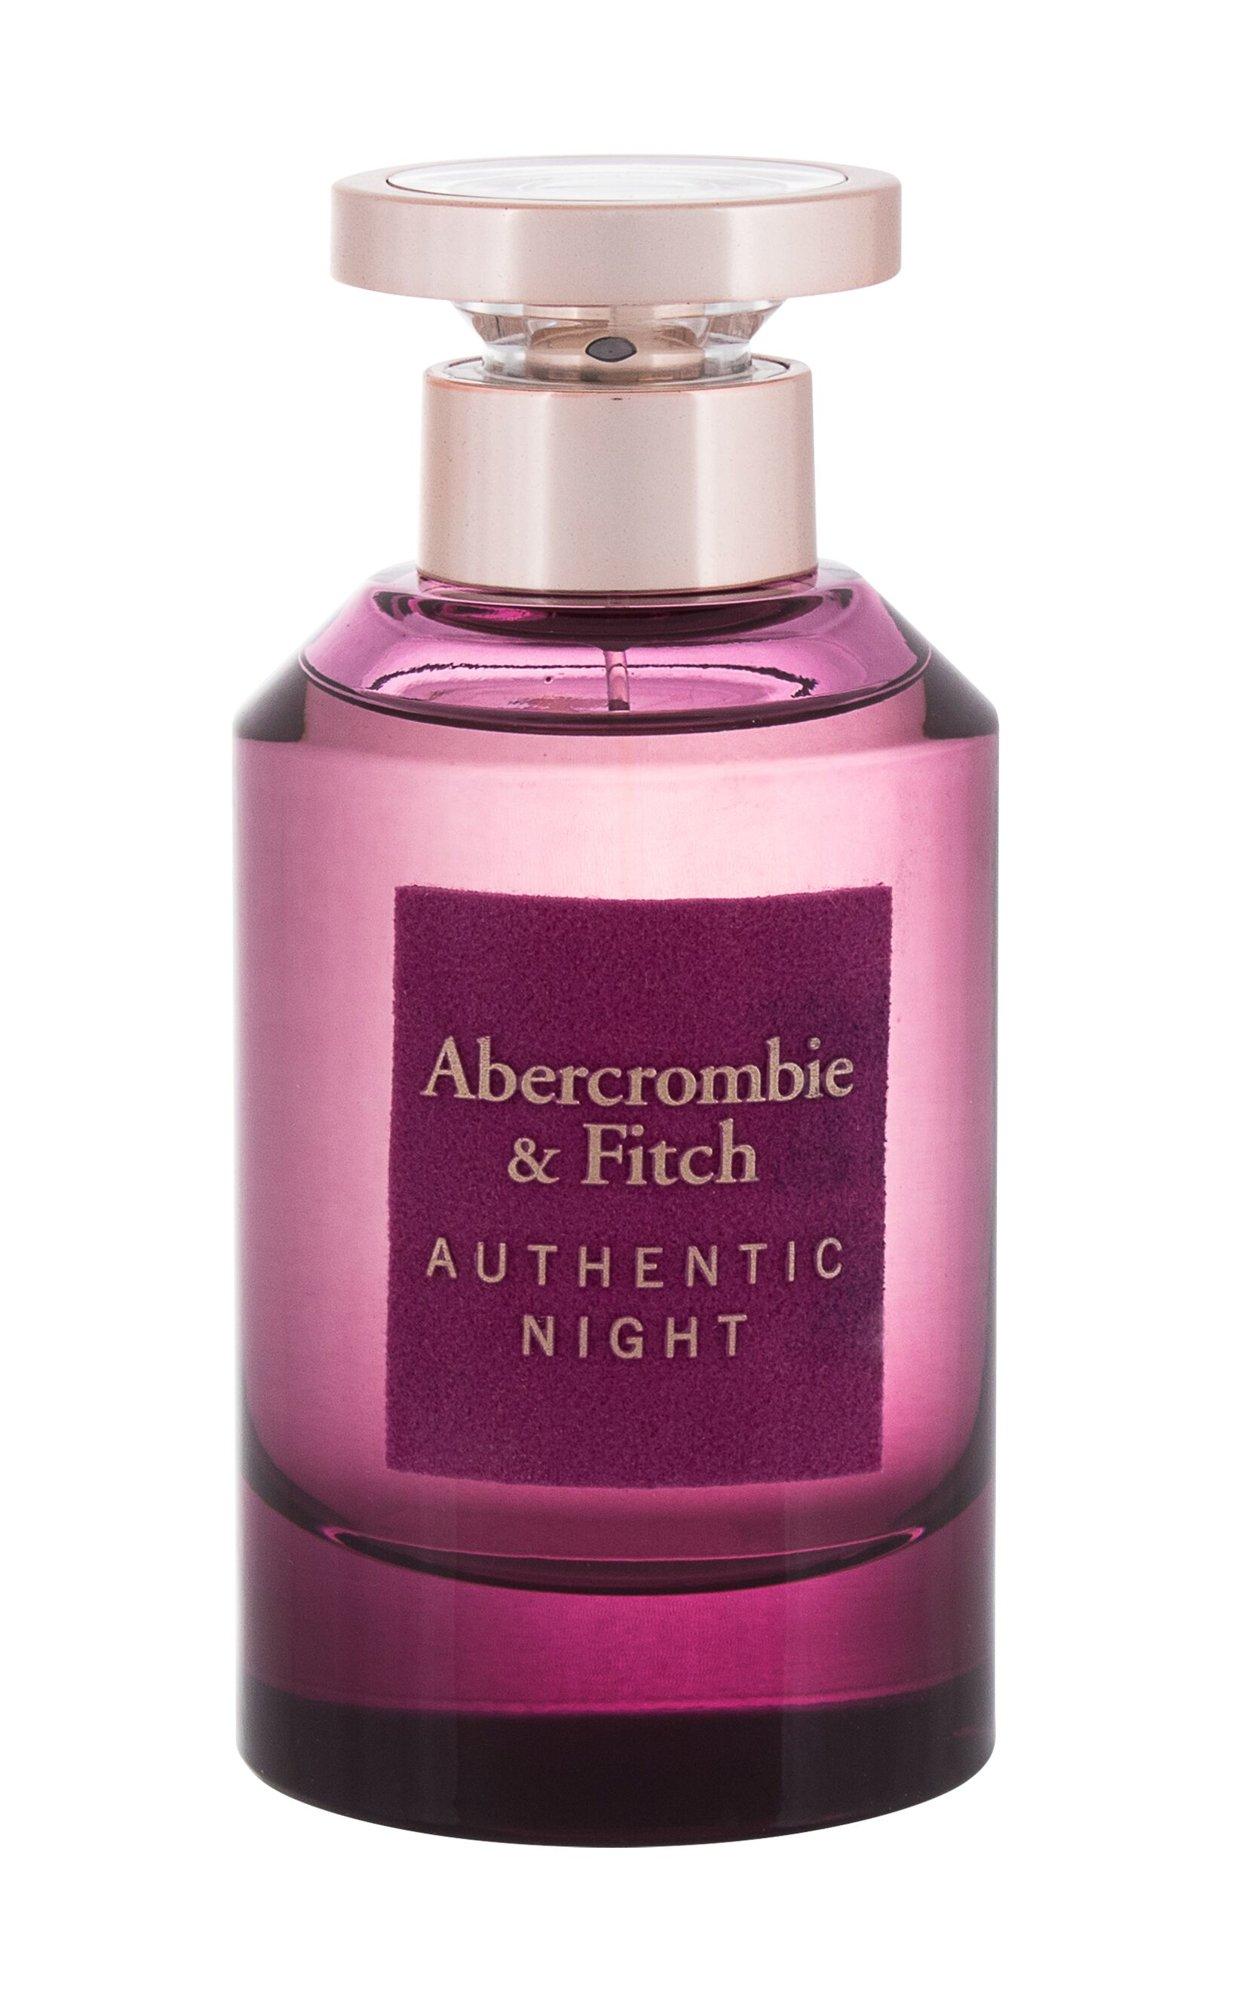 Abercrombie & Fitch Authentic Night, Parfumovaná voda 100ml